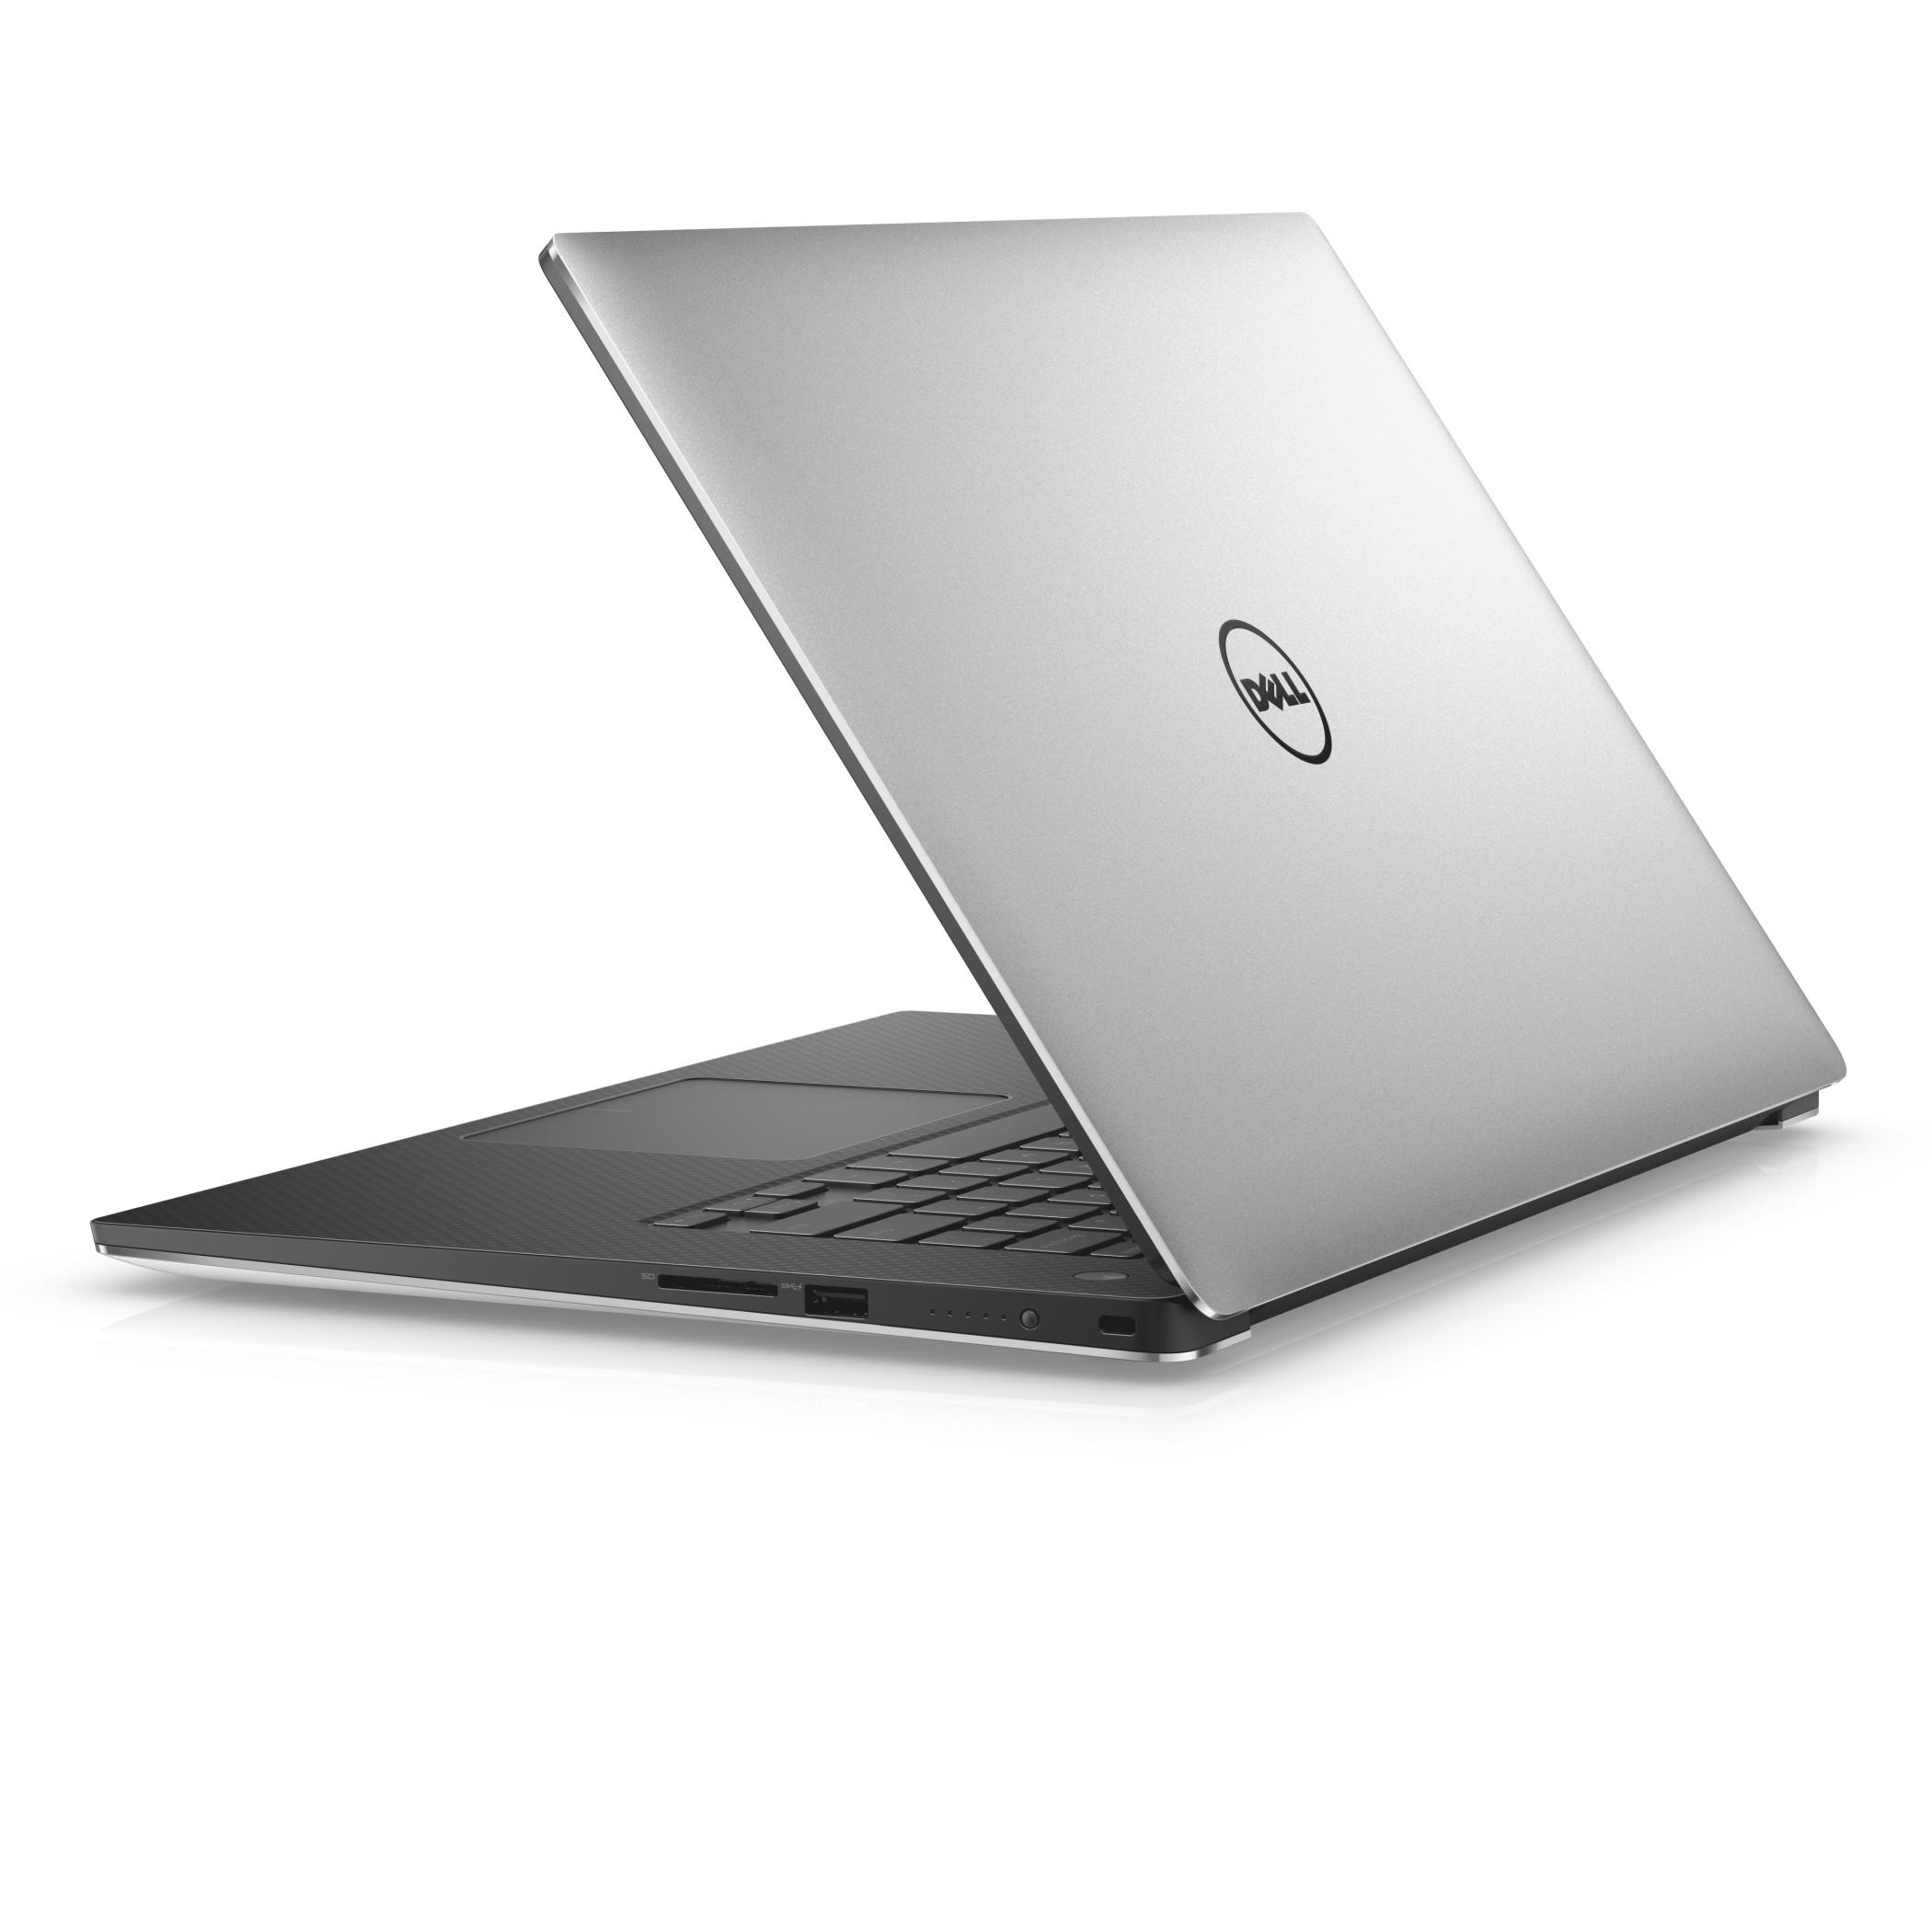 "DELL - Dell XPS 15 9550 15"" FHD i5-6300HQ/8GB/1TB+32GB/GTX960M/HDMI/WIFI/BT/MCR/W10/2RNB"